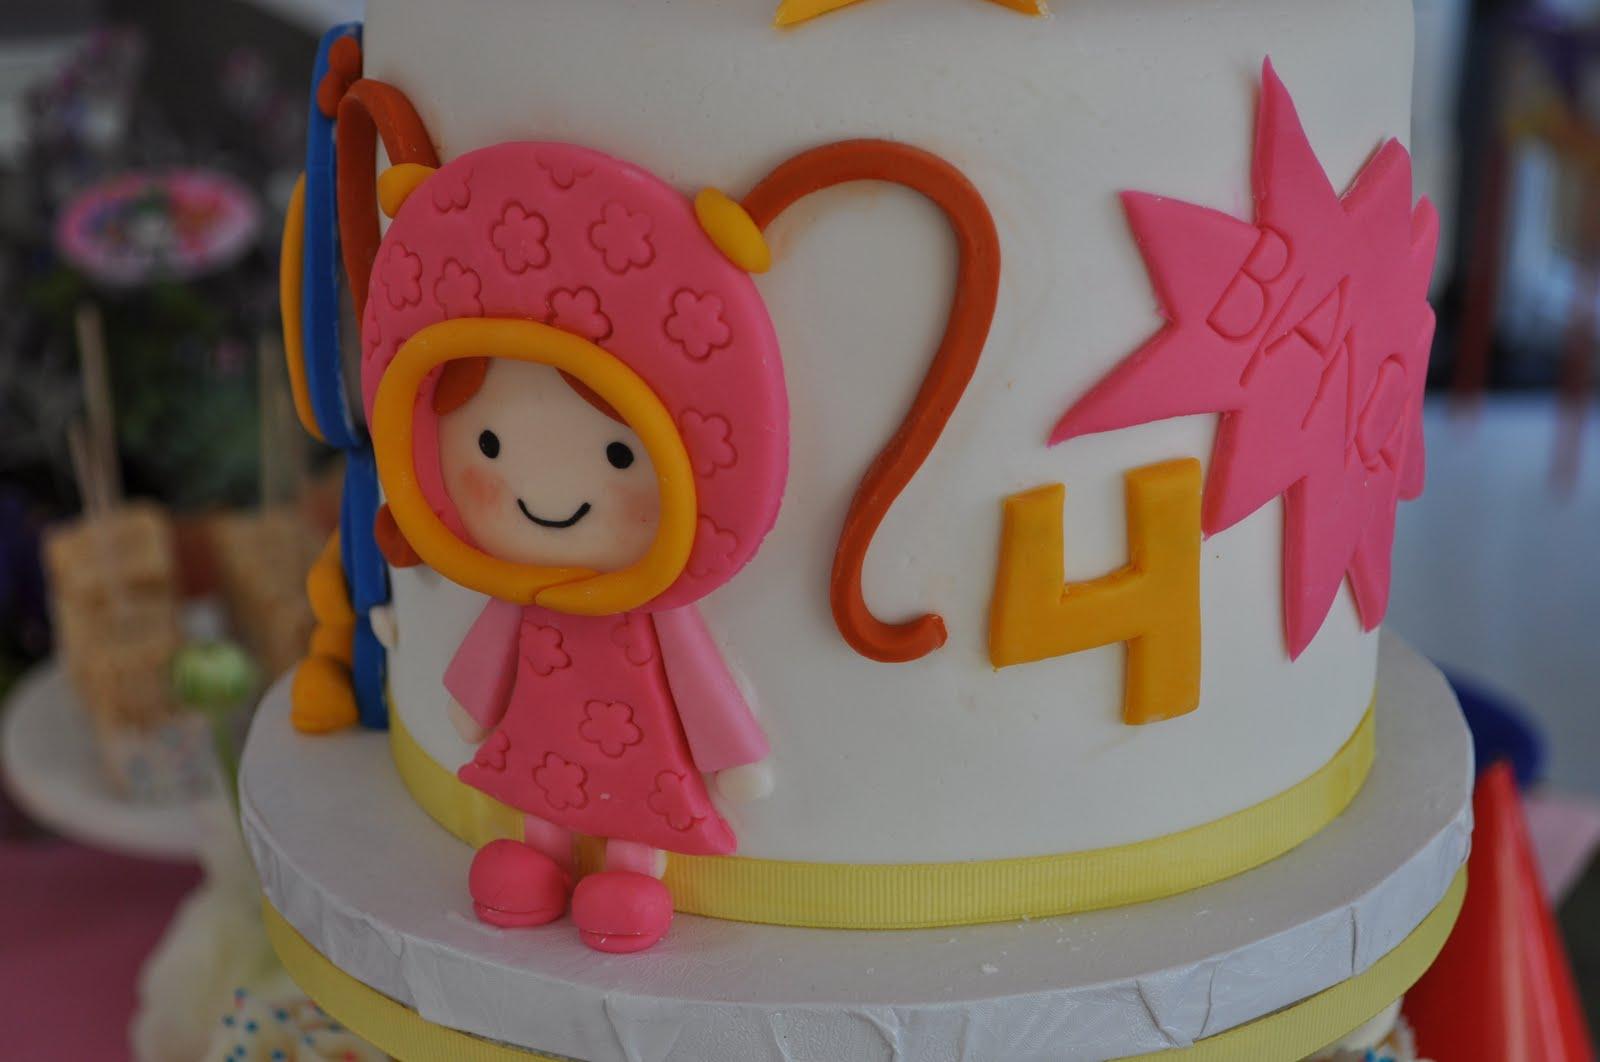 Milli Edible Image Custom Cake Decoration Topper On Pinterest